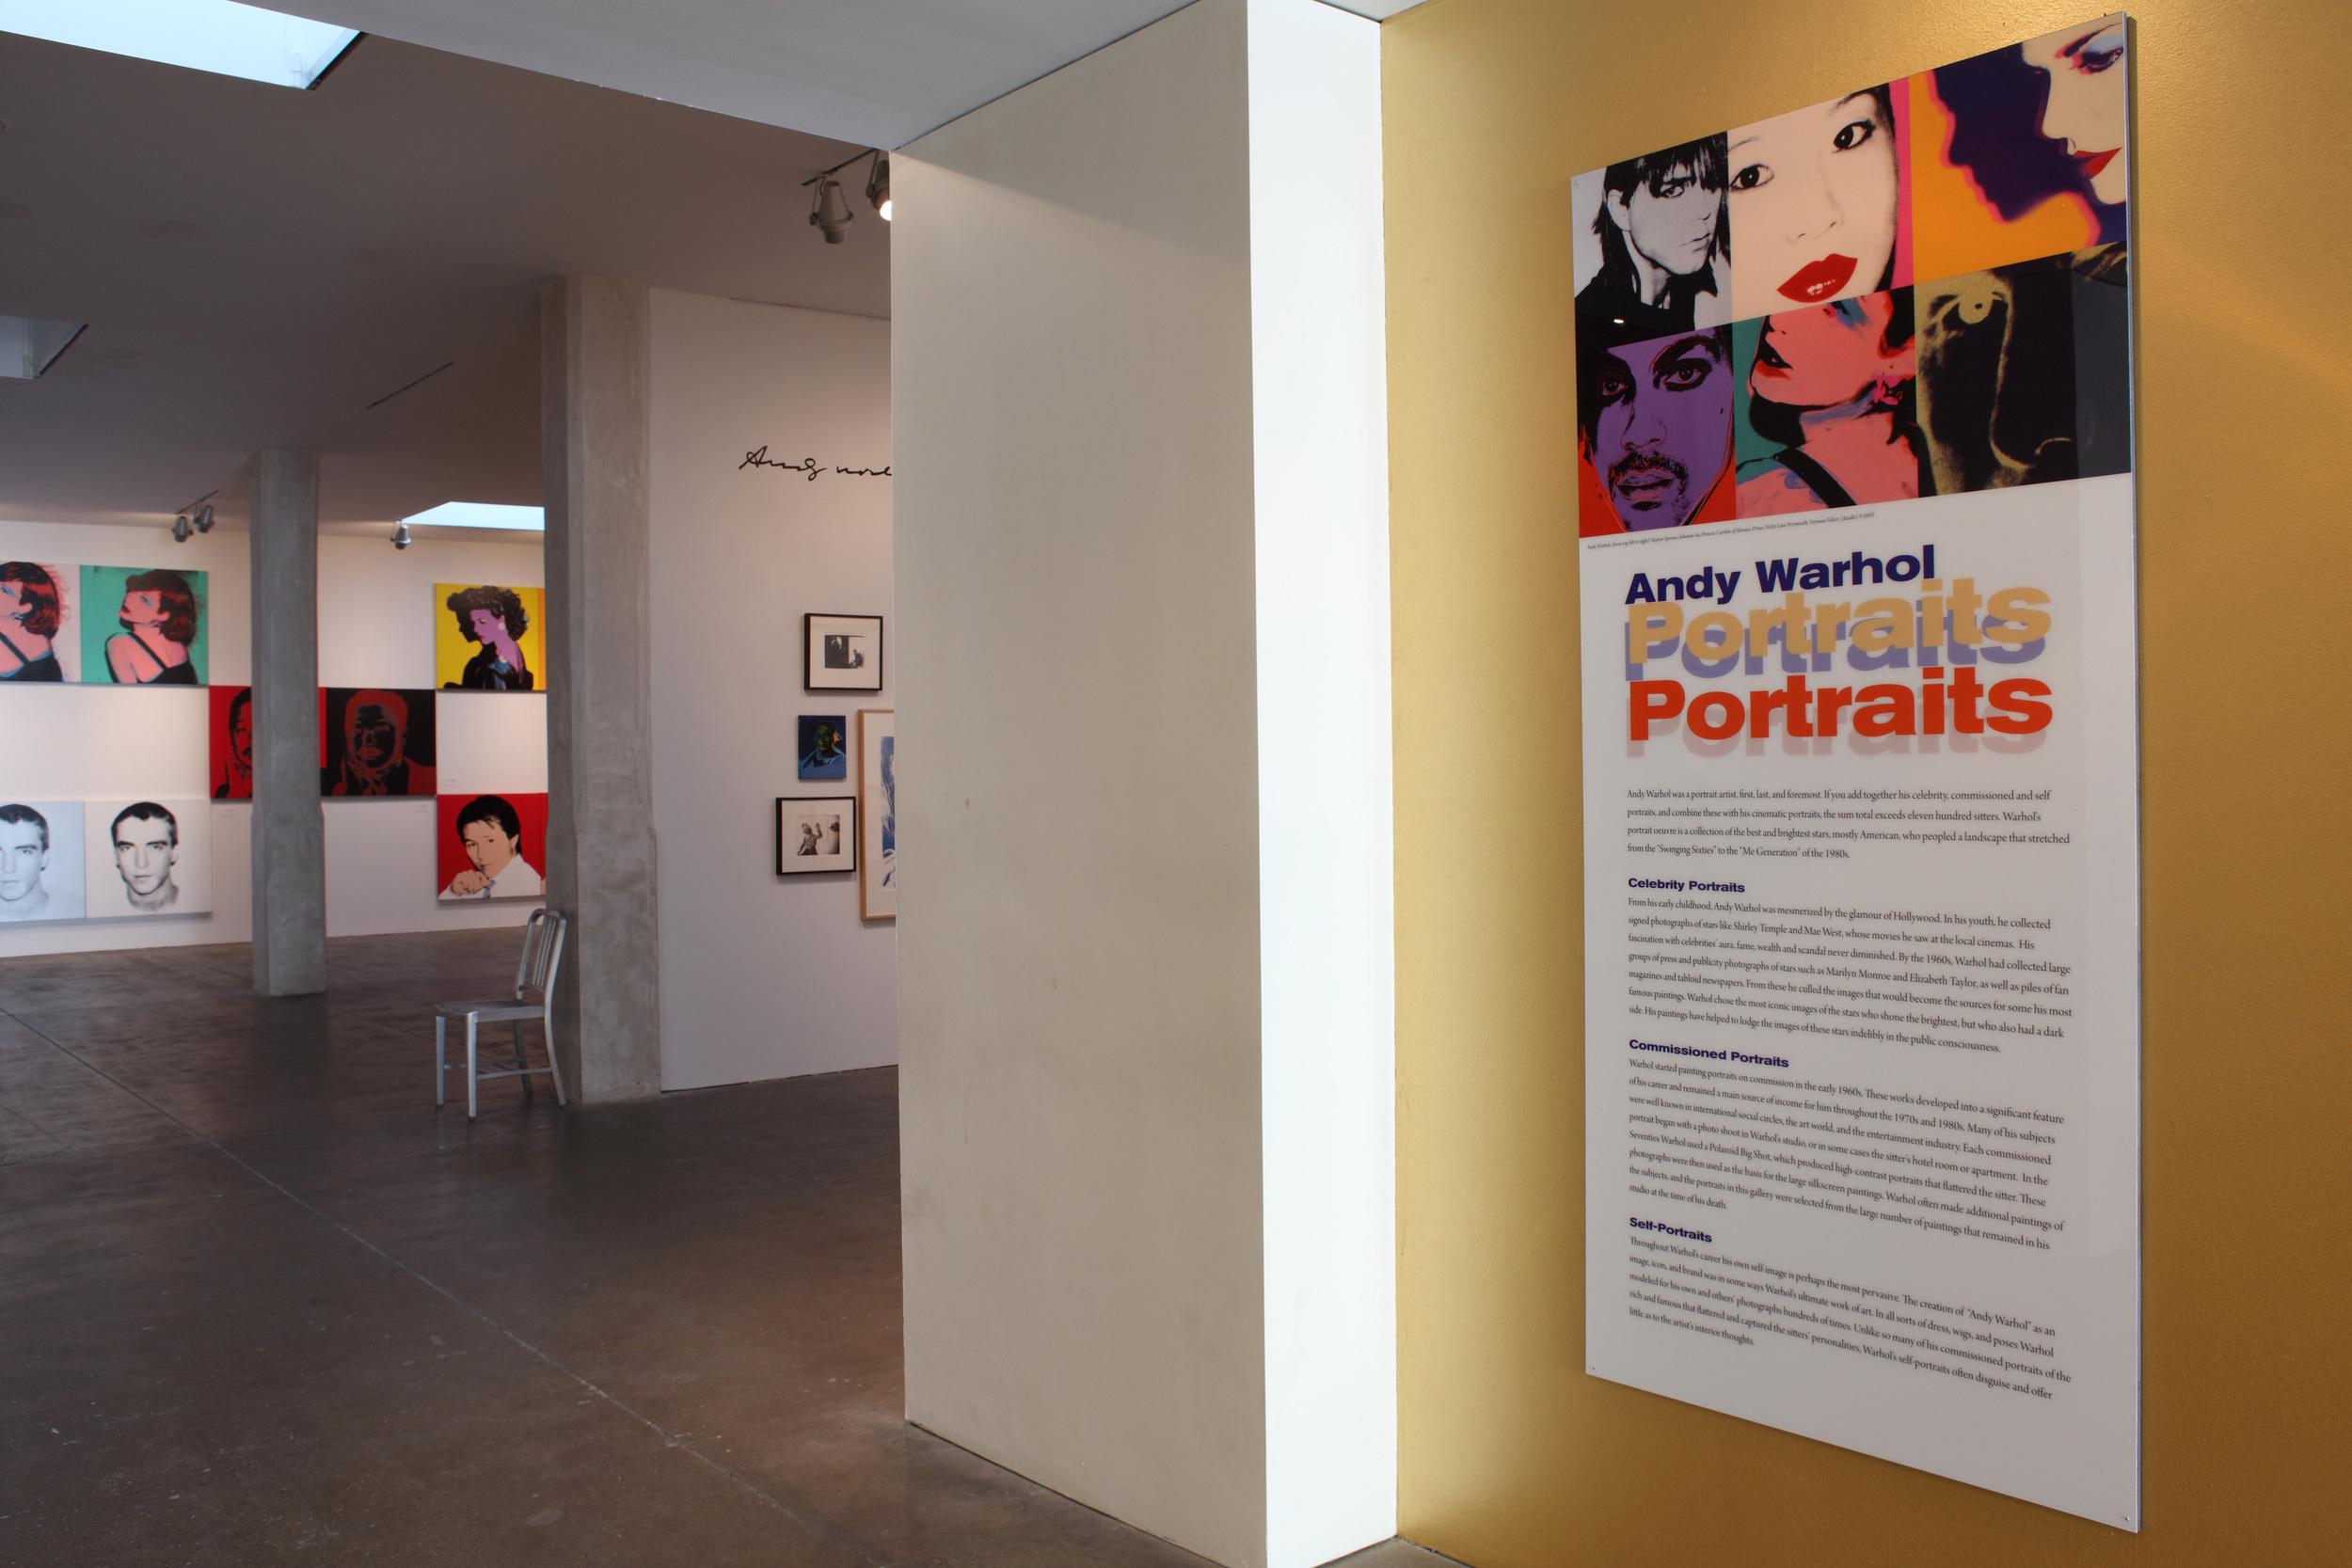 Andy Warhol Portraits installation 2010 001.JPG